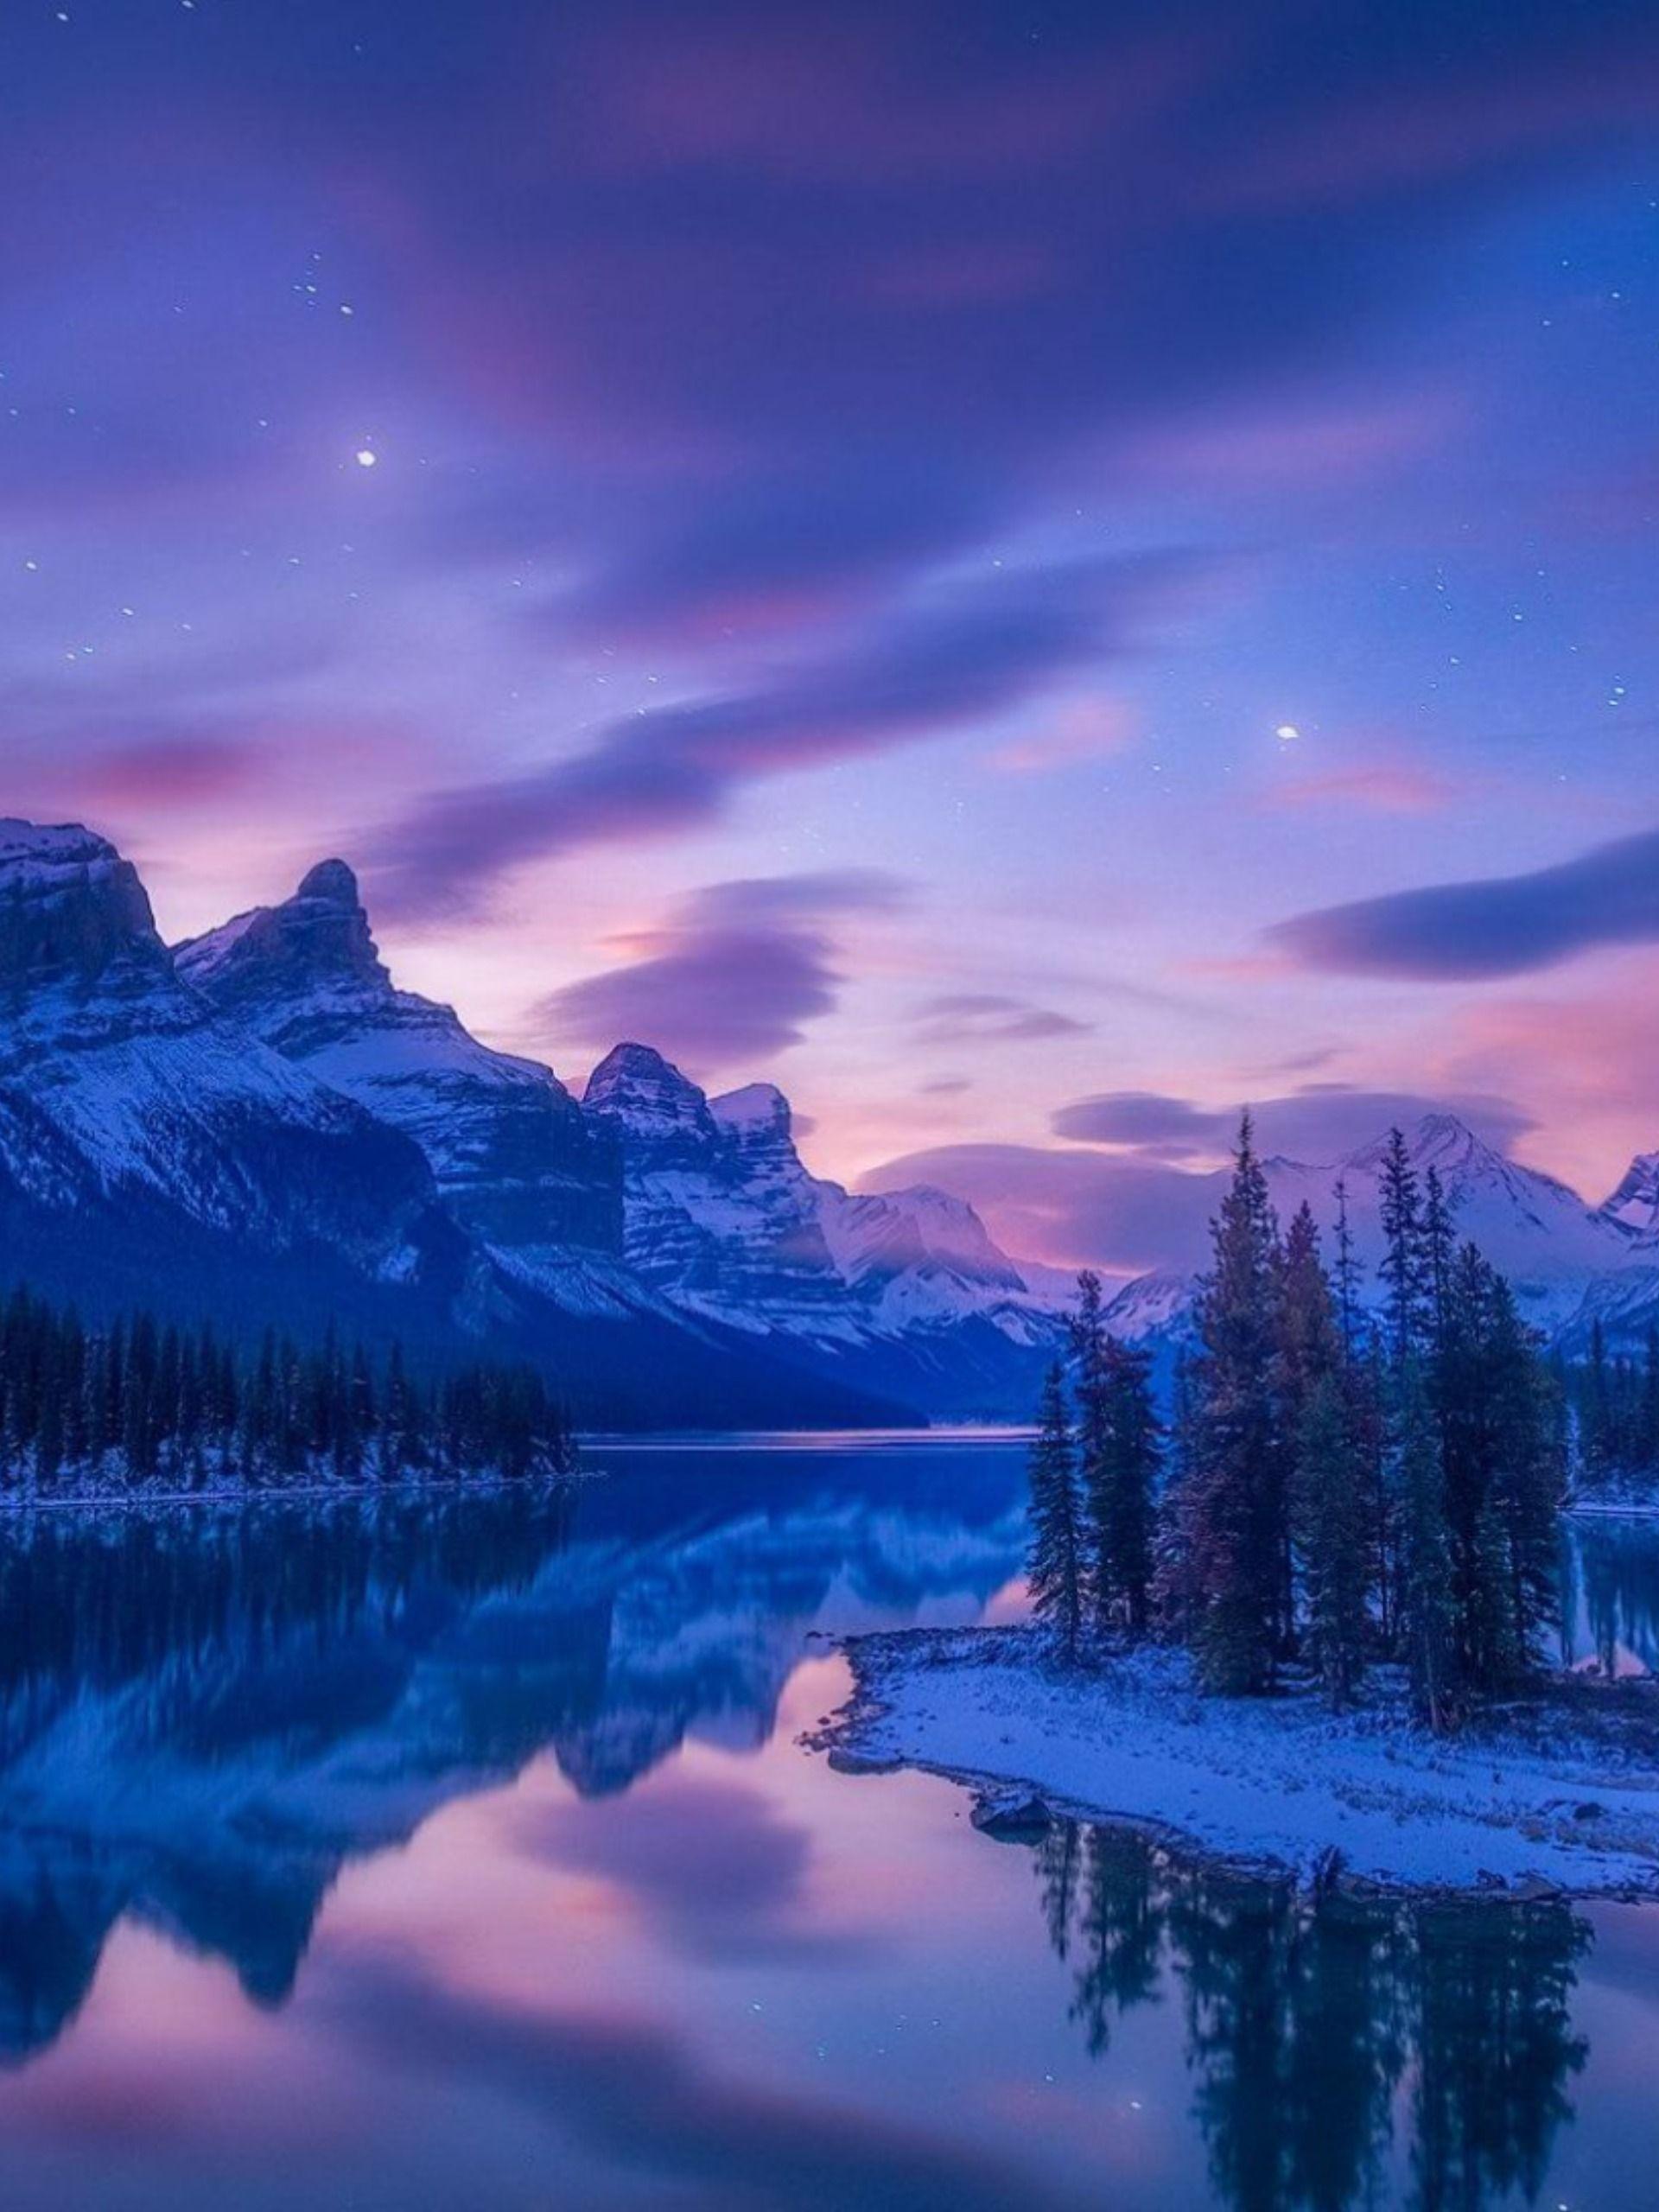 Wallpaper mountains, river, lake, winter, snow, night, HD, Nature #23277